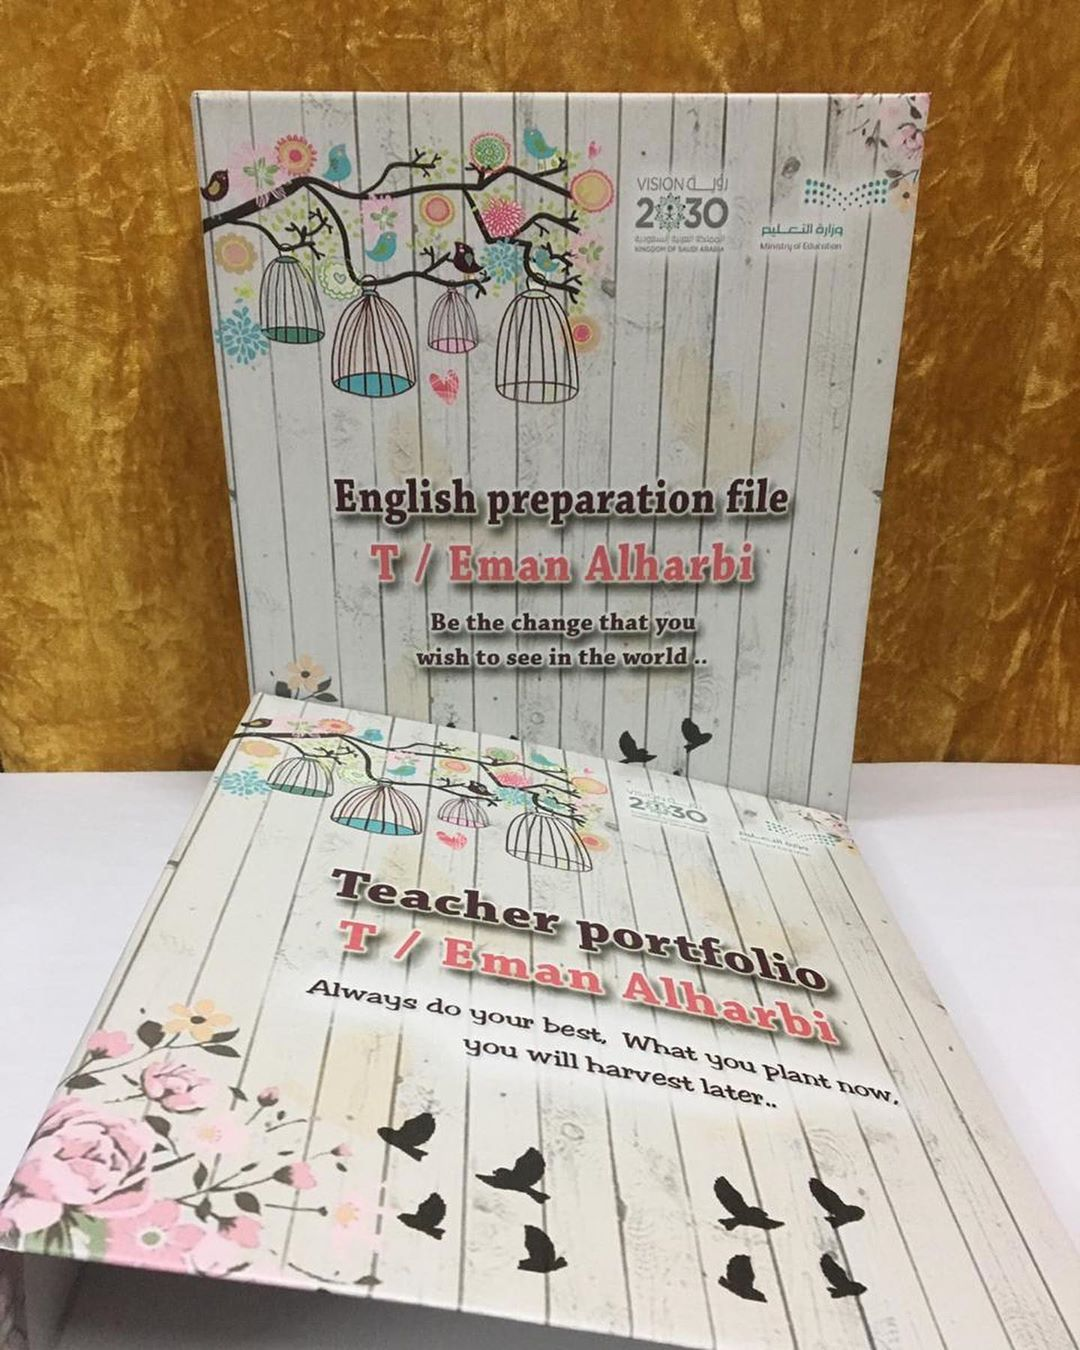 English Preparation File Teacher Portfolio Teacher Portfolio Teacher Portfolio